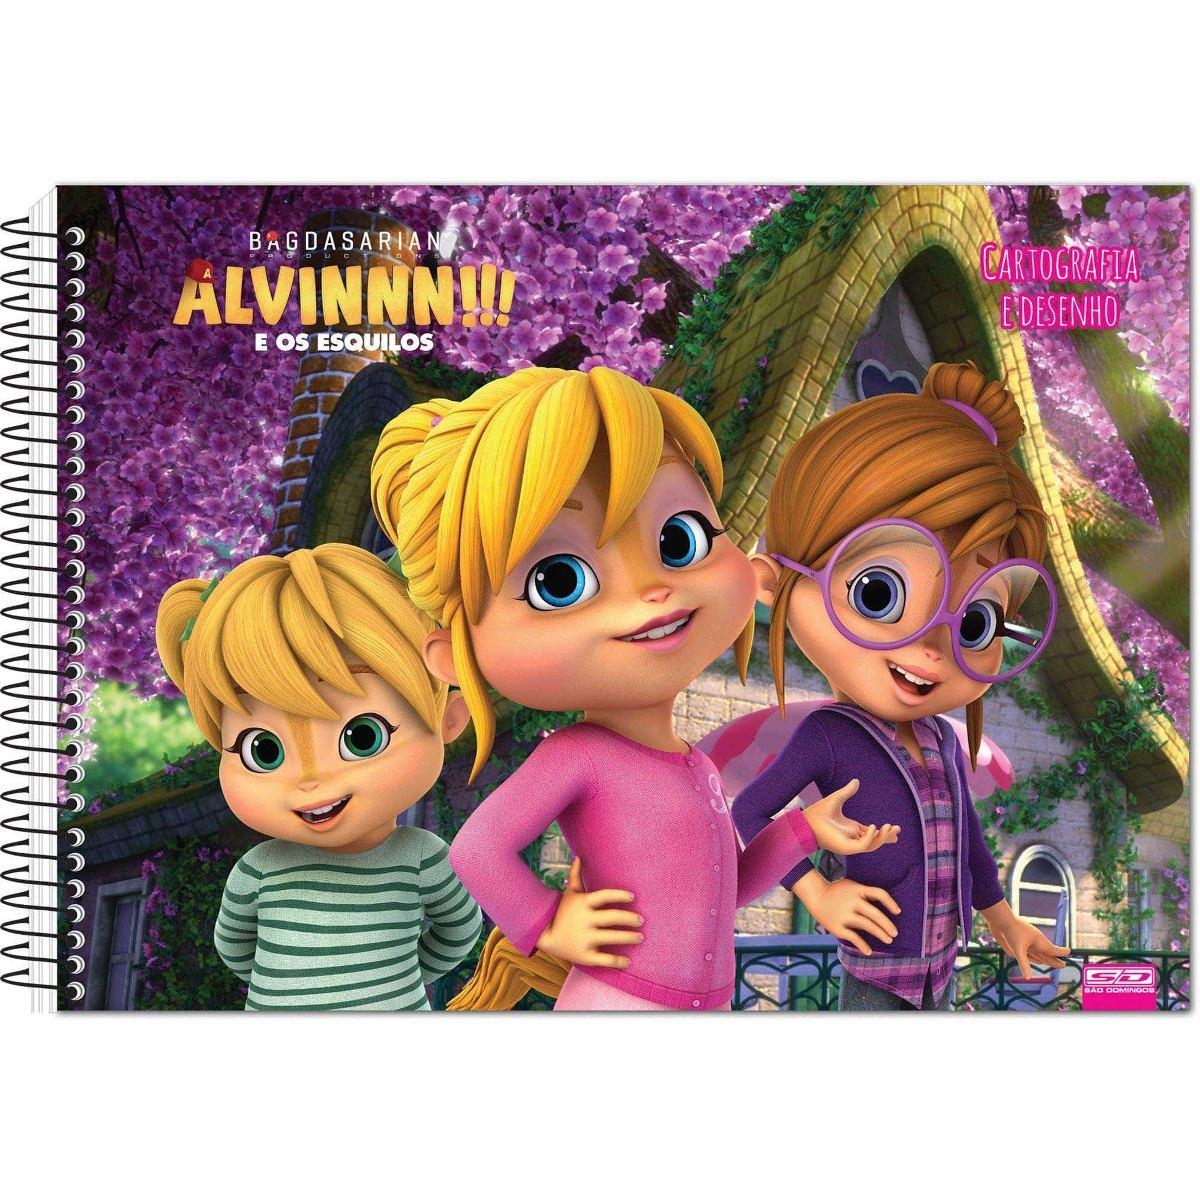 Caderno Desenho Univ Capa Dura Alvin E Os Esquilos 5 Un R 61